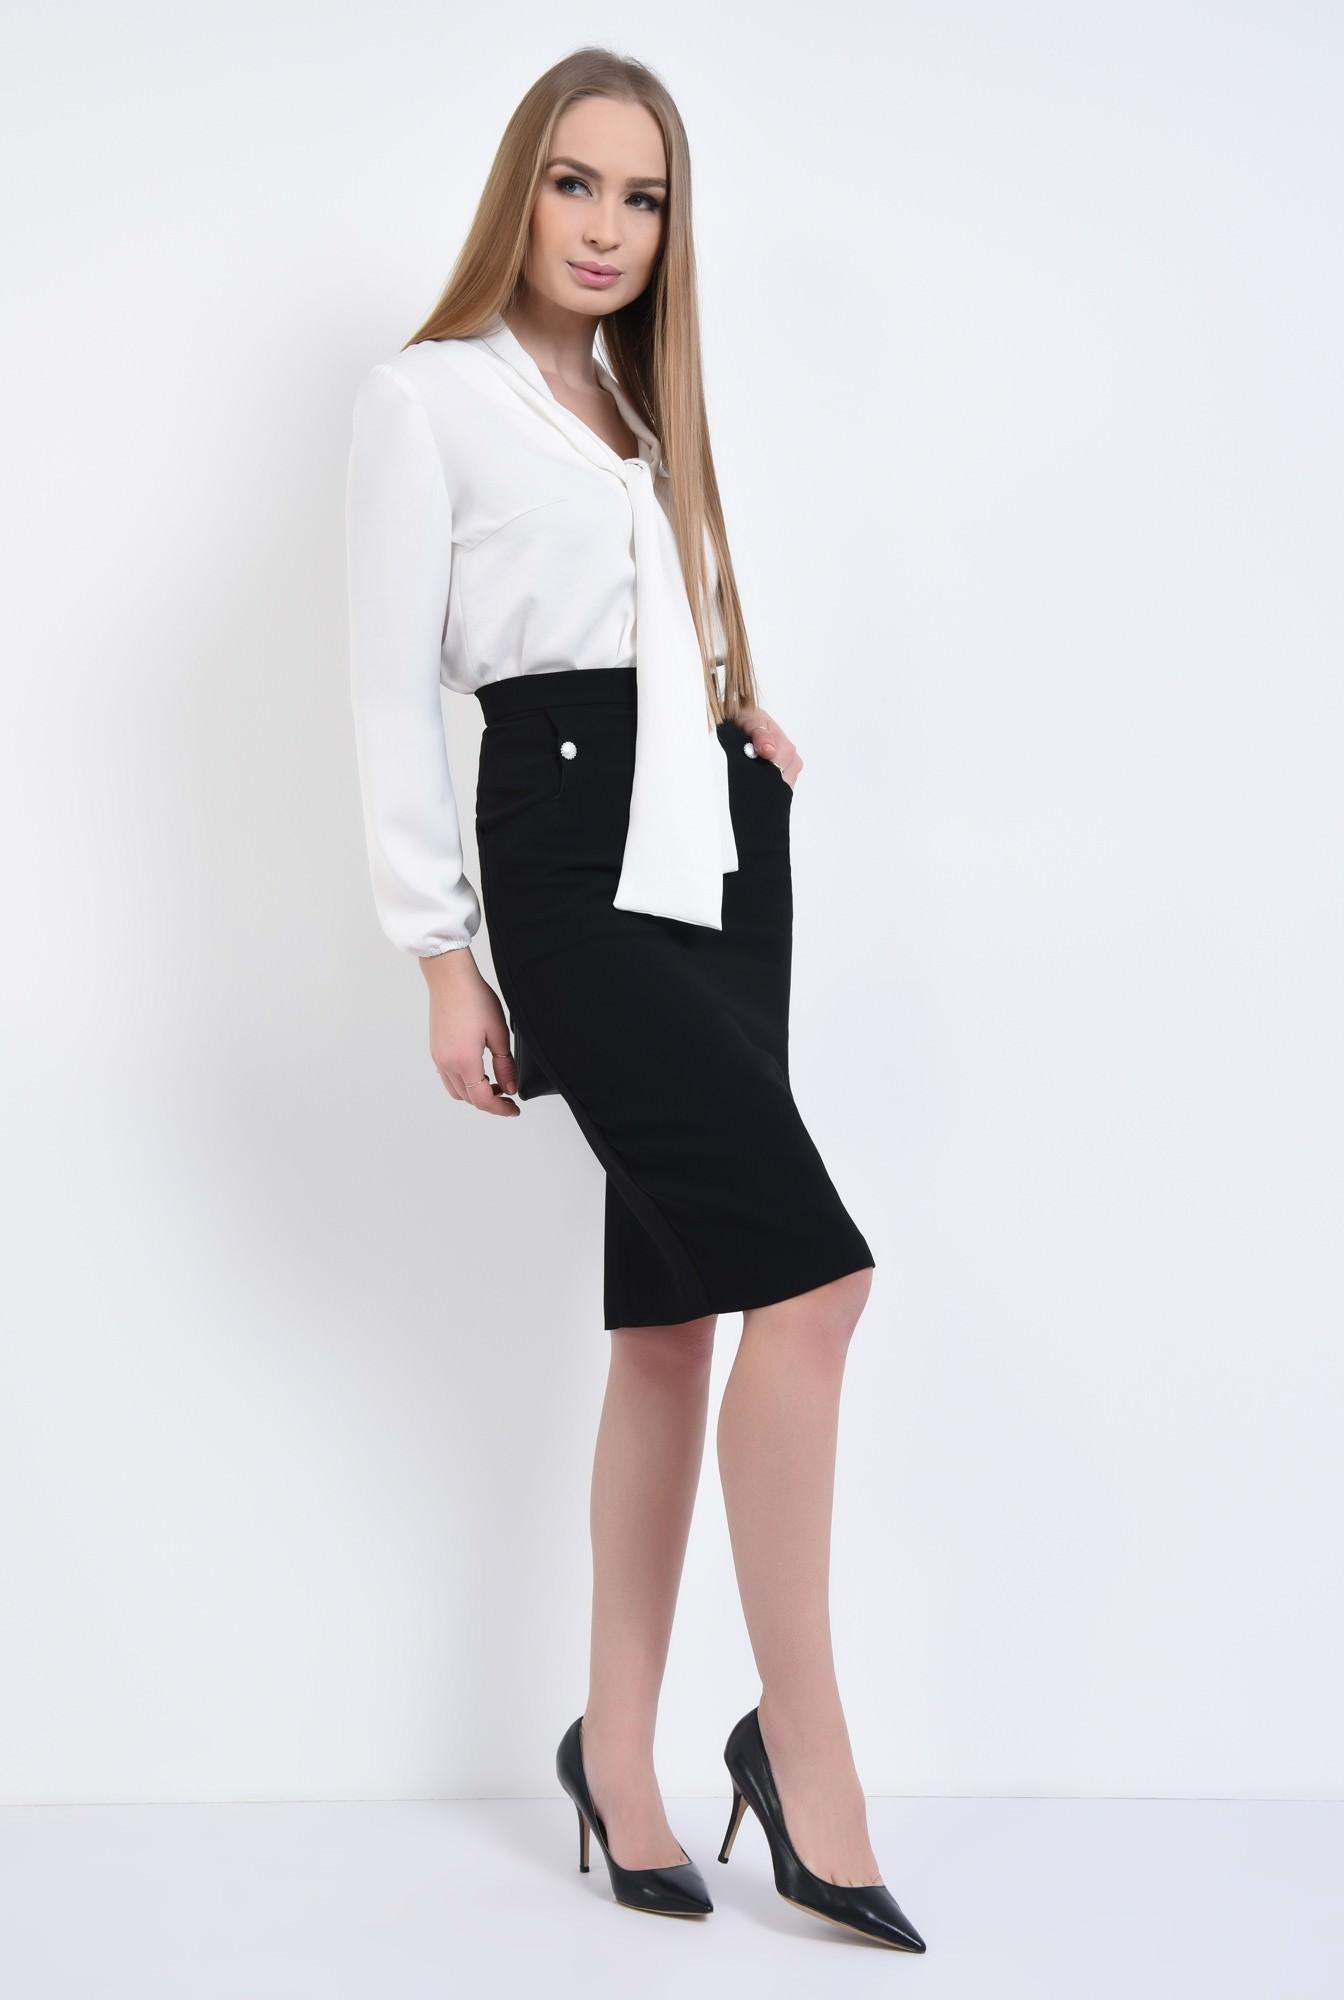 3 - Bluza office, alb, maneci lungi